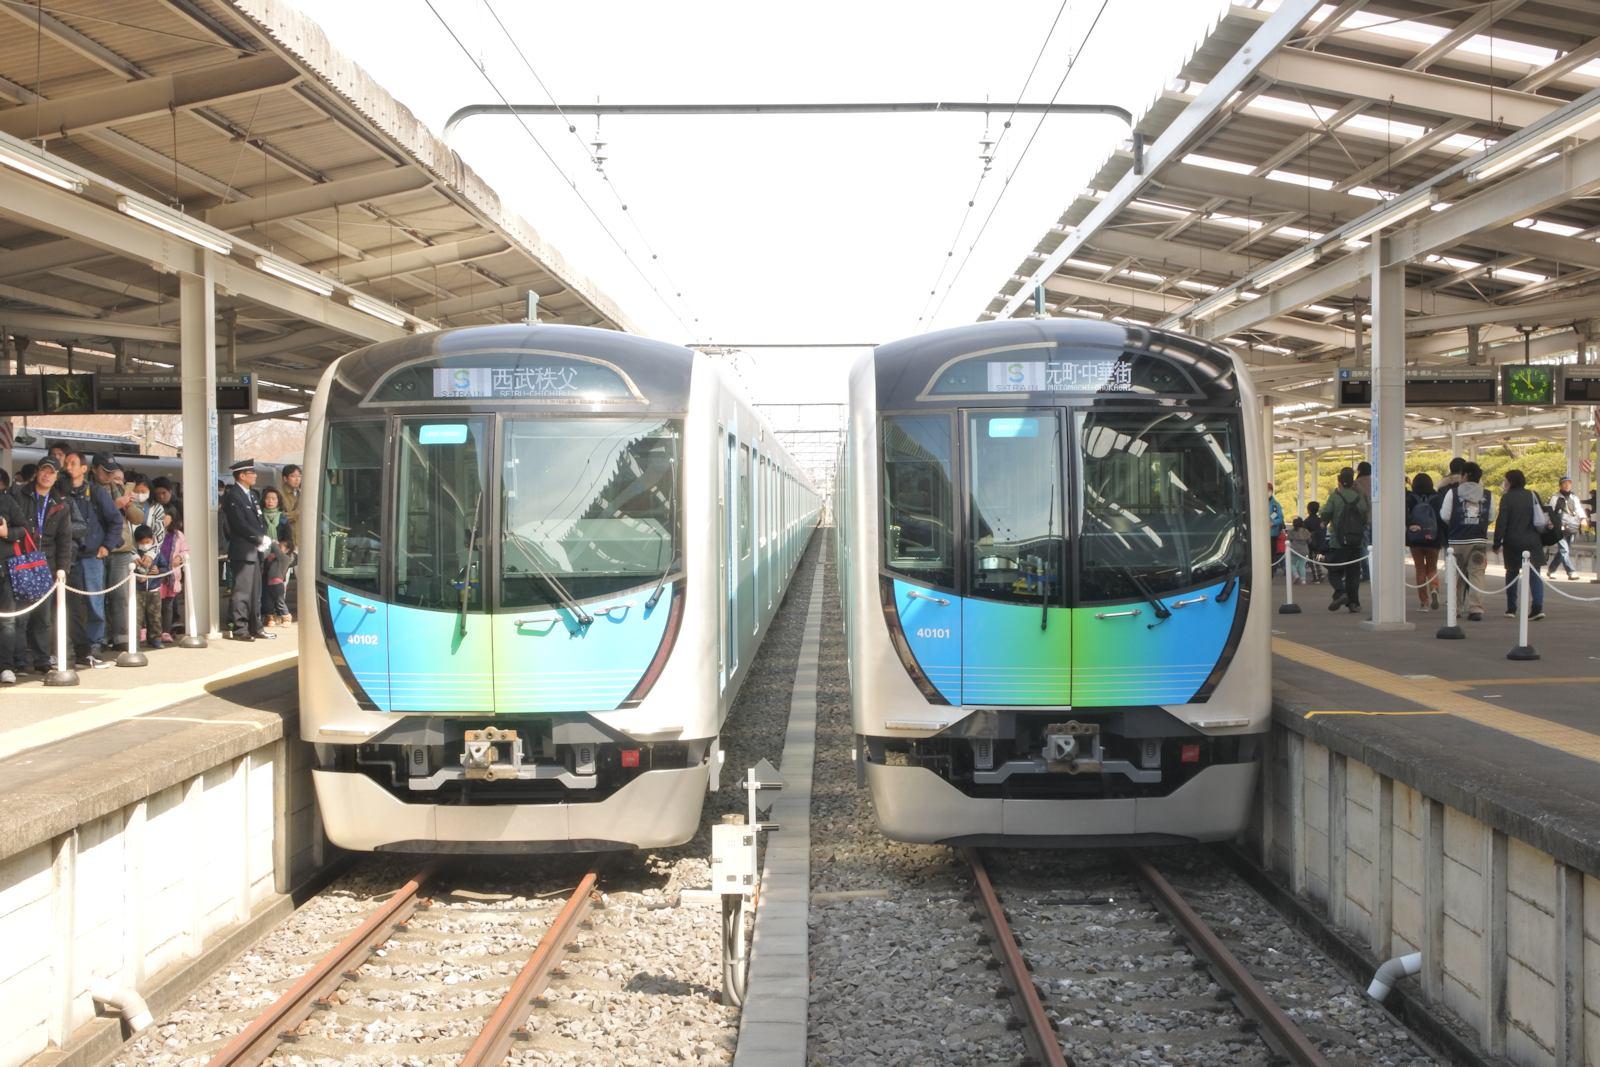 Seibu 40000 Series at Seibu-kyujo-mae [Seibu Dome] Station